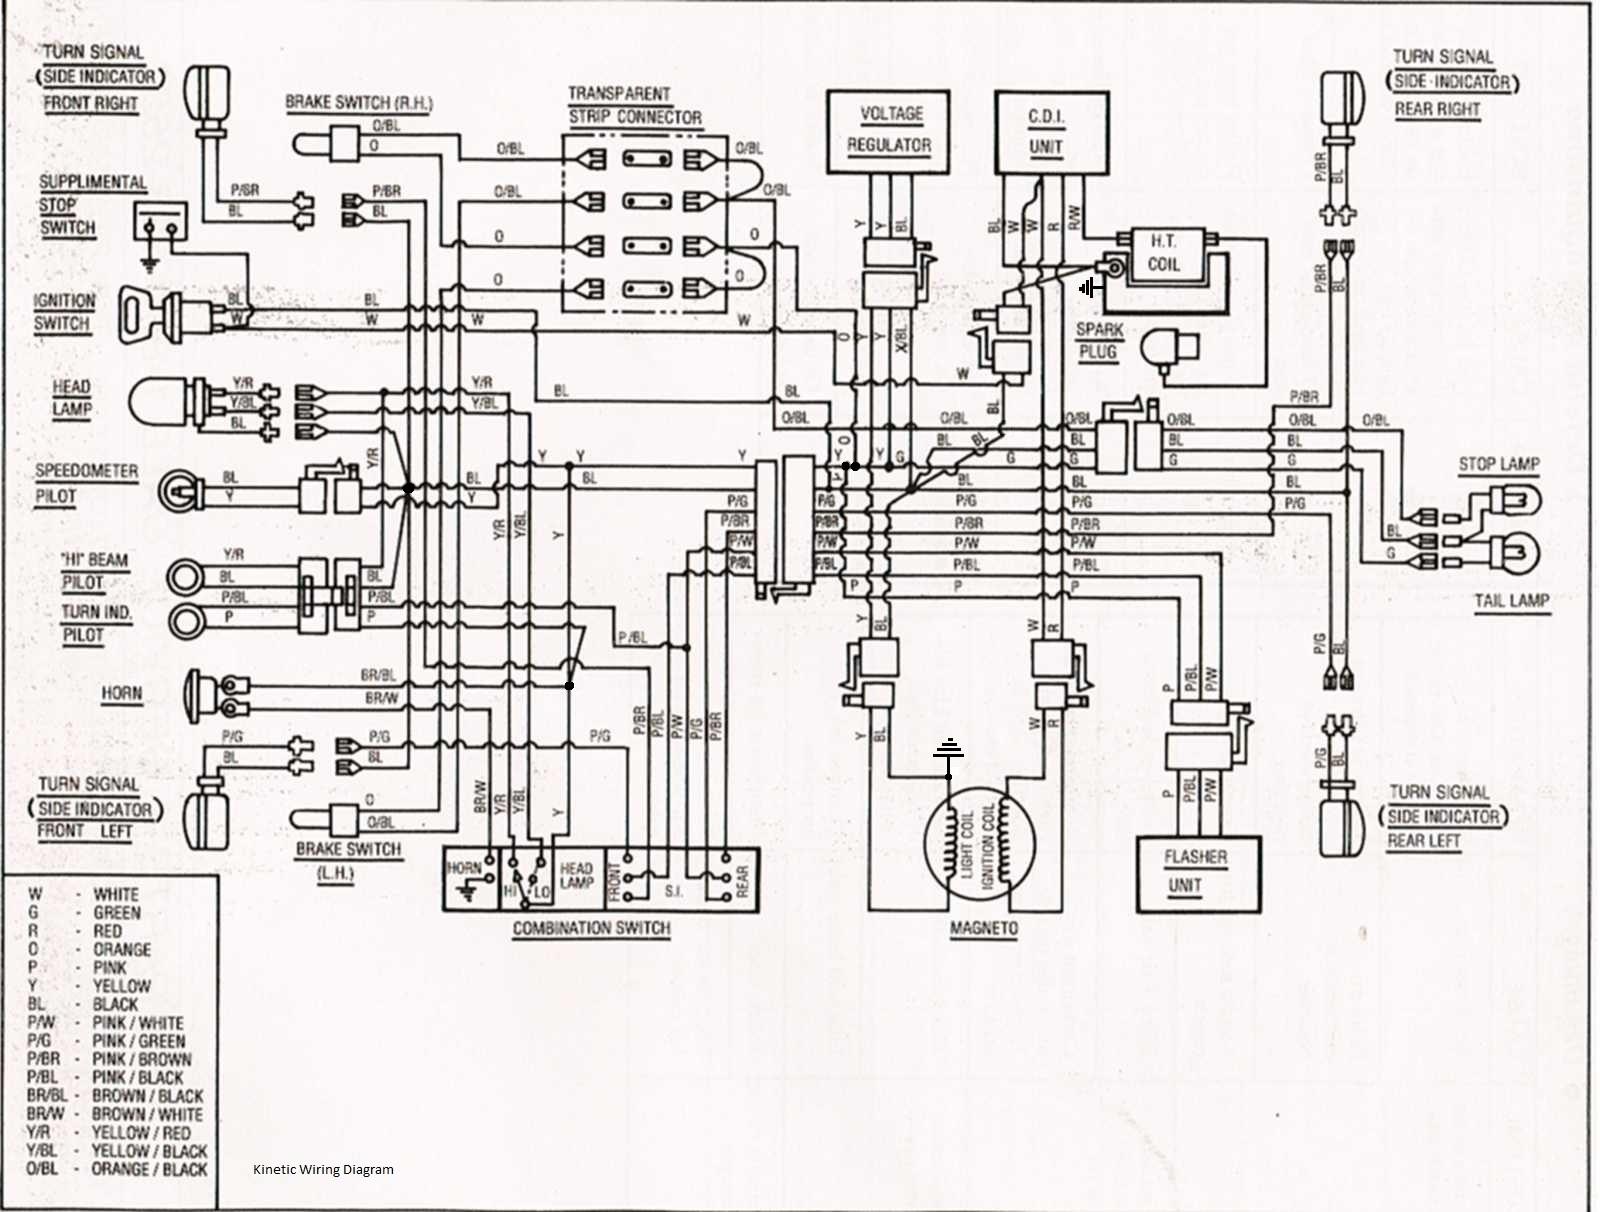 Ey 2979 Honda Moped Wiring Diagram Circuit Wiring Diagram Download Diagram